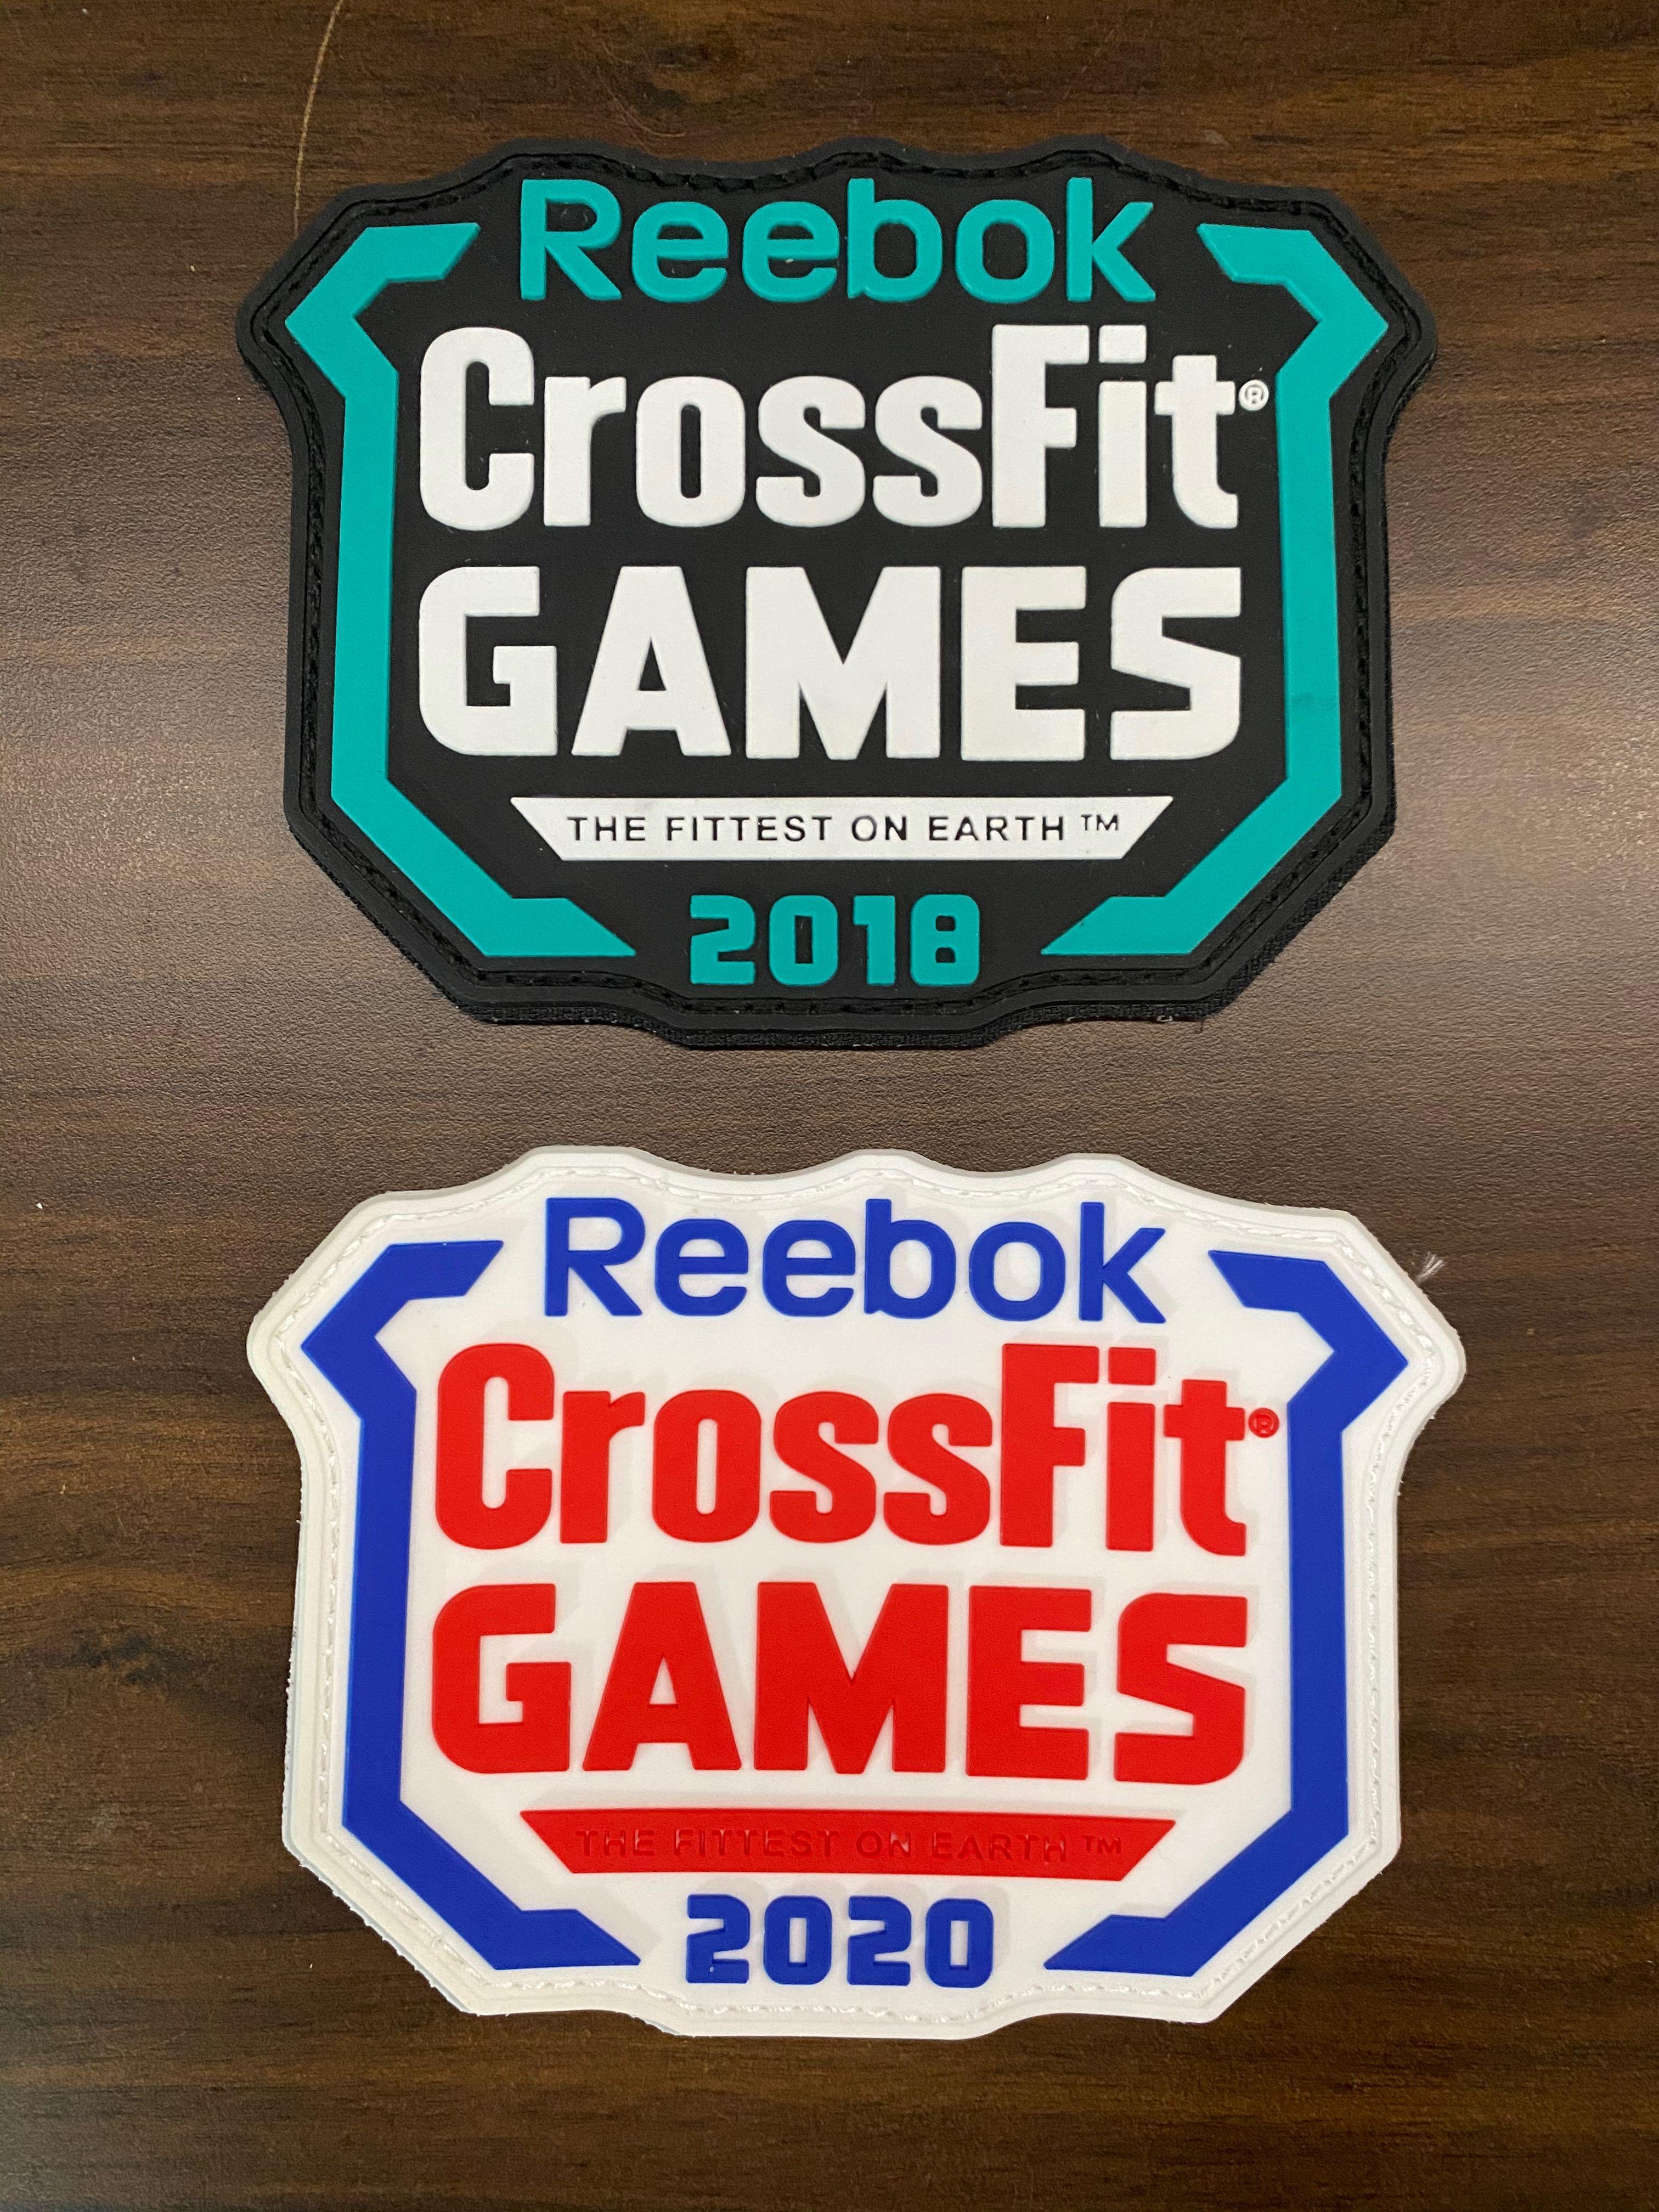 Cross fit crossfit morale Patch USA morale patch REEBOK